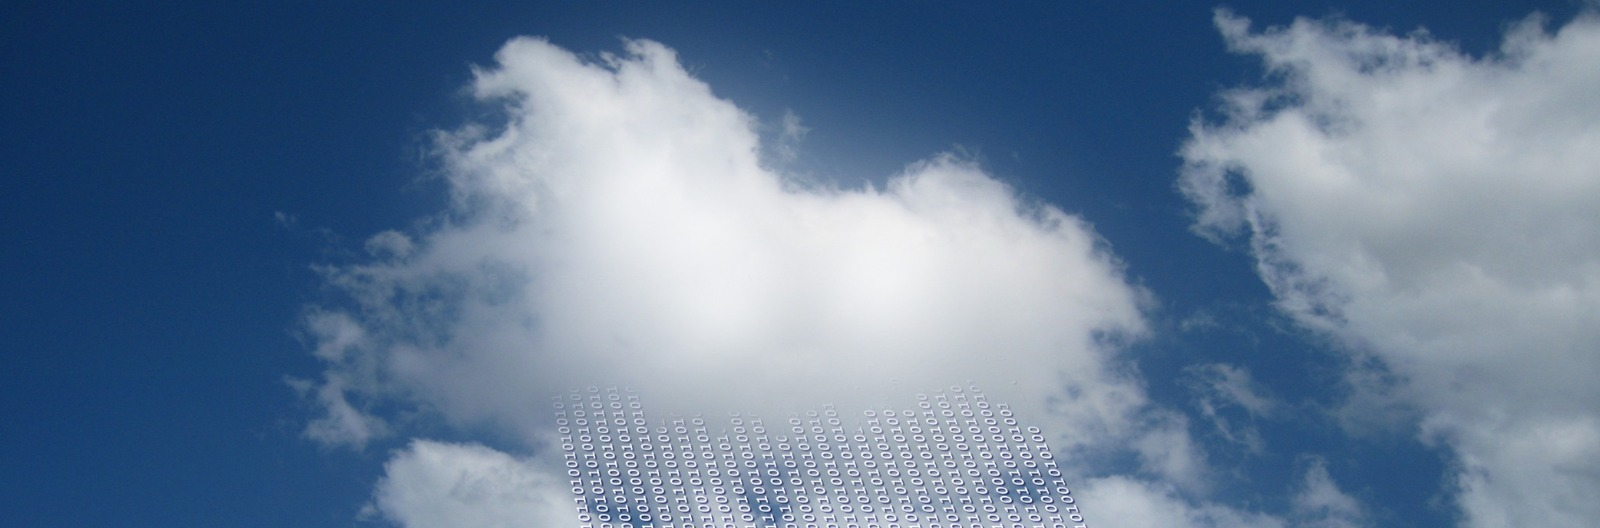 Capito Public Cloud